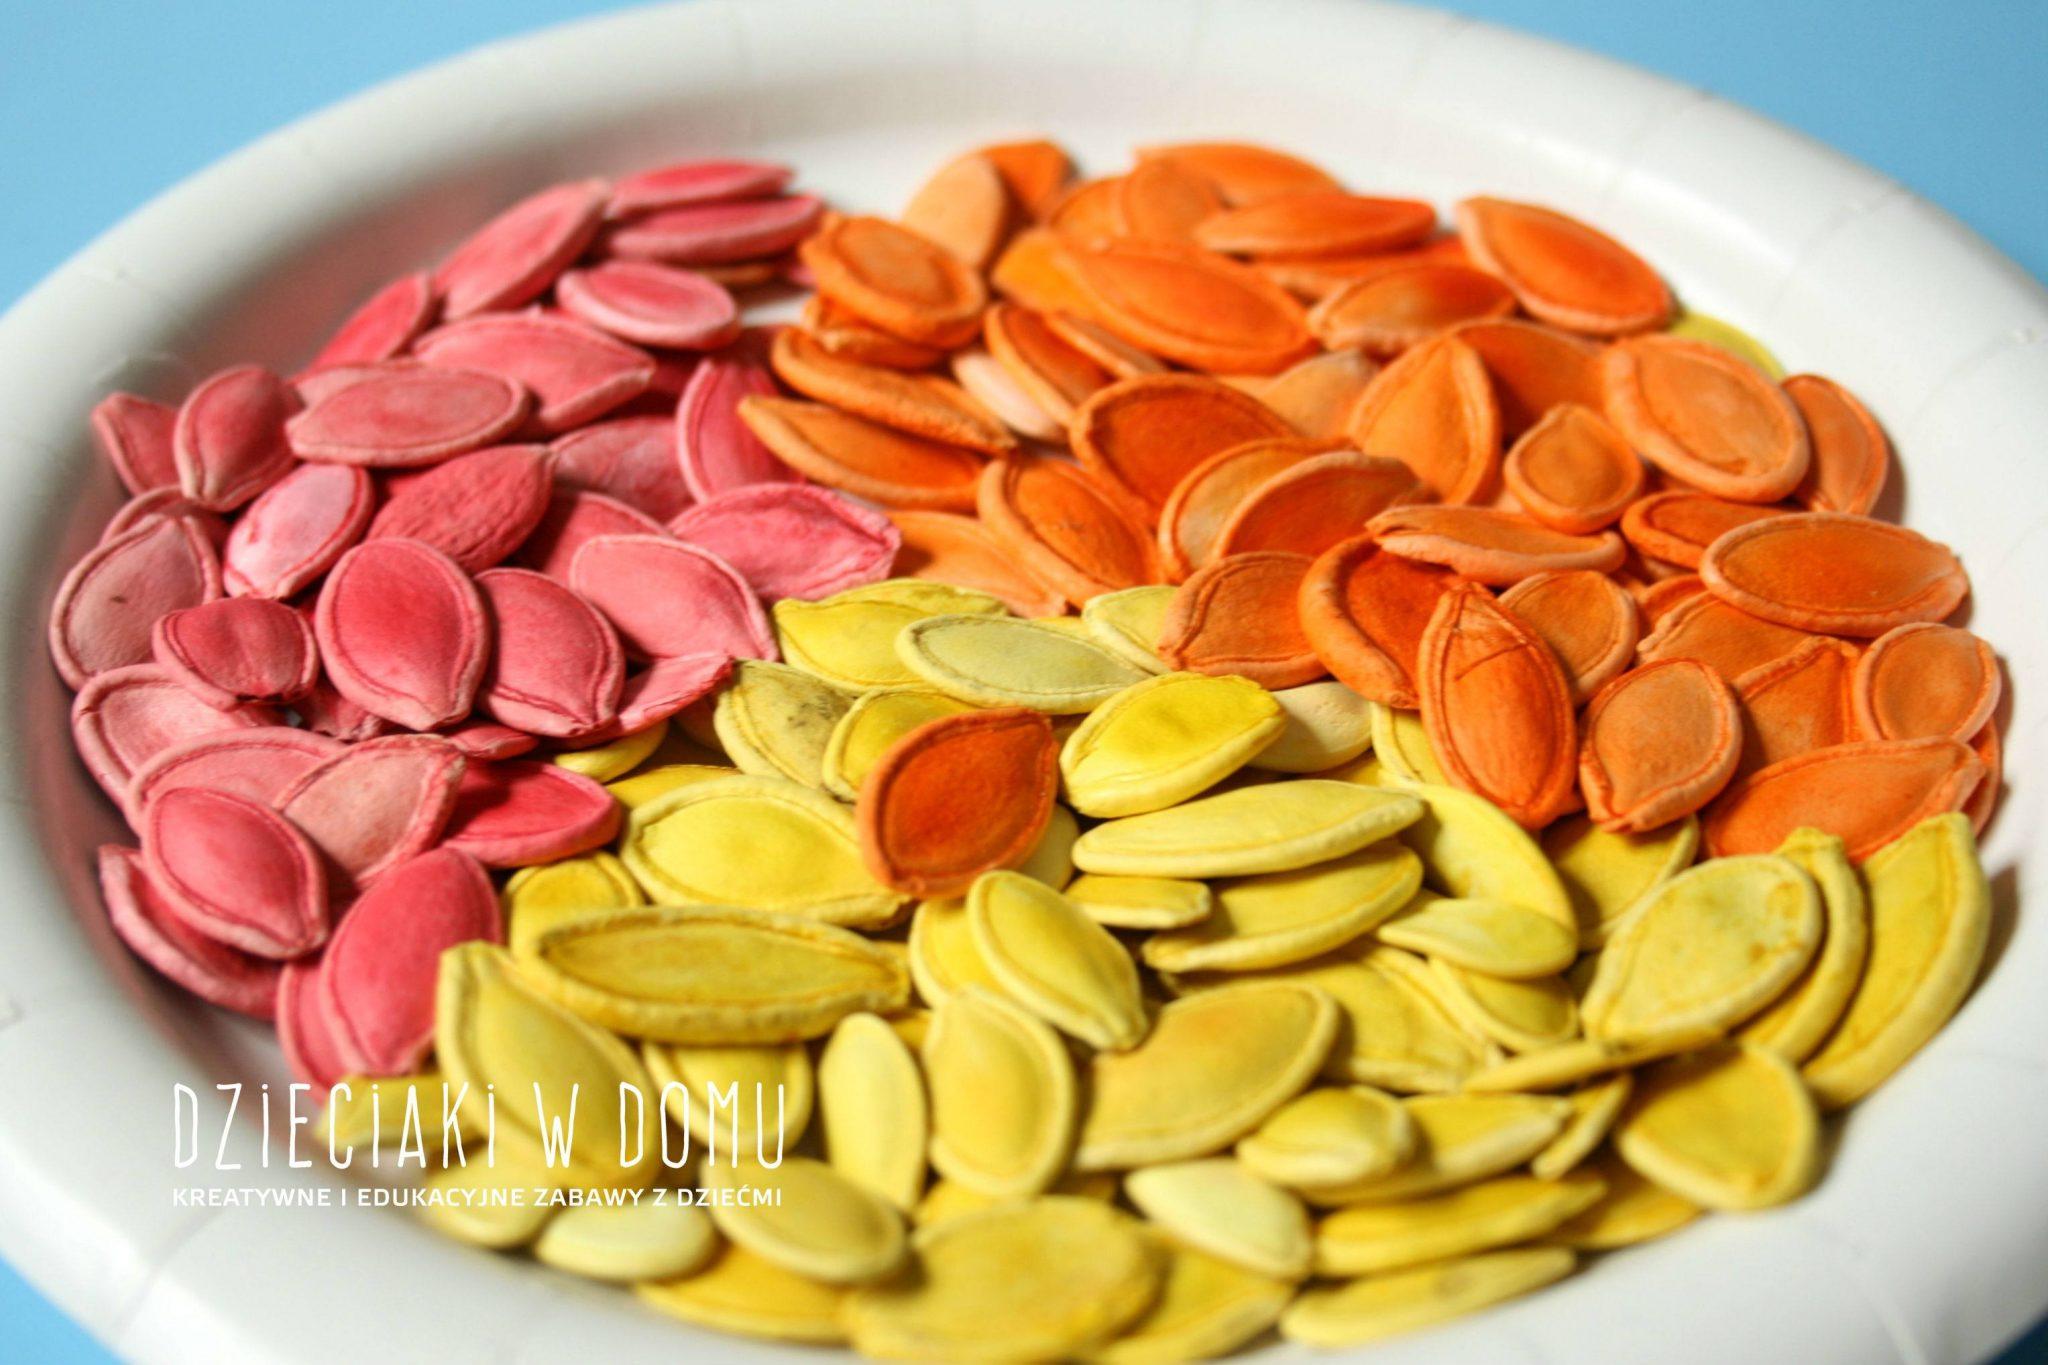 farbowane pestki dyni